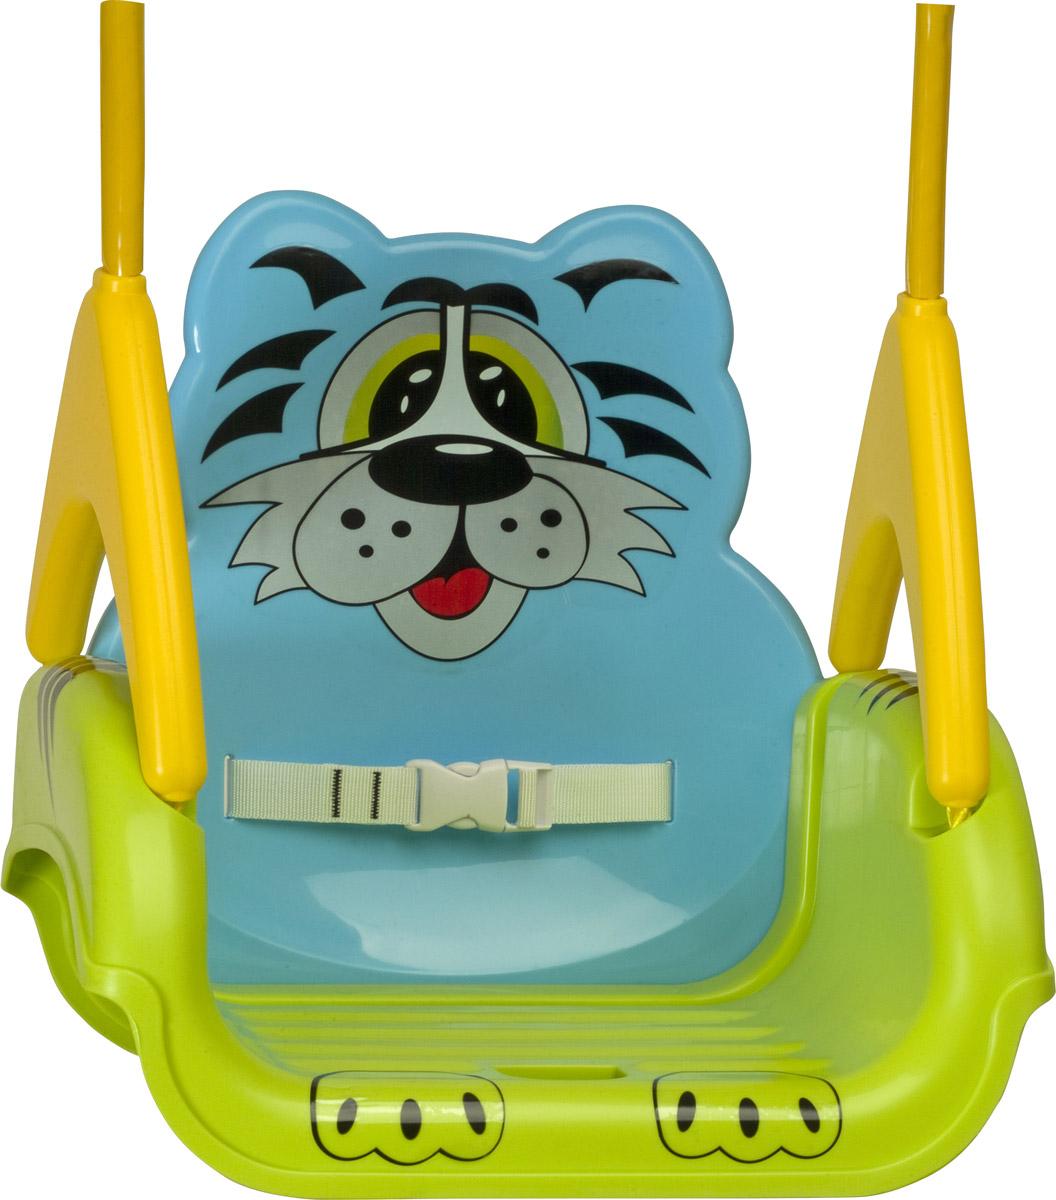 Marian Plast Качели детские Tiger Swing